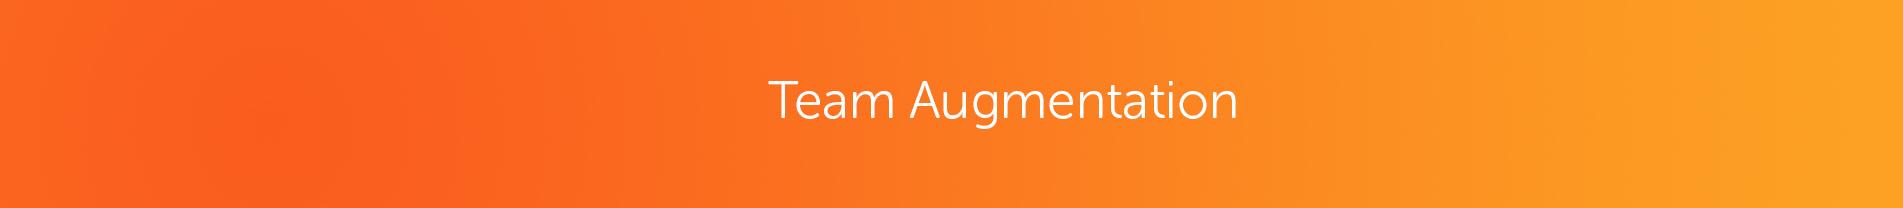 Team augmentation The MangoTech